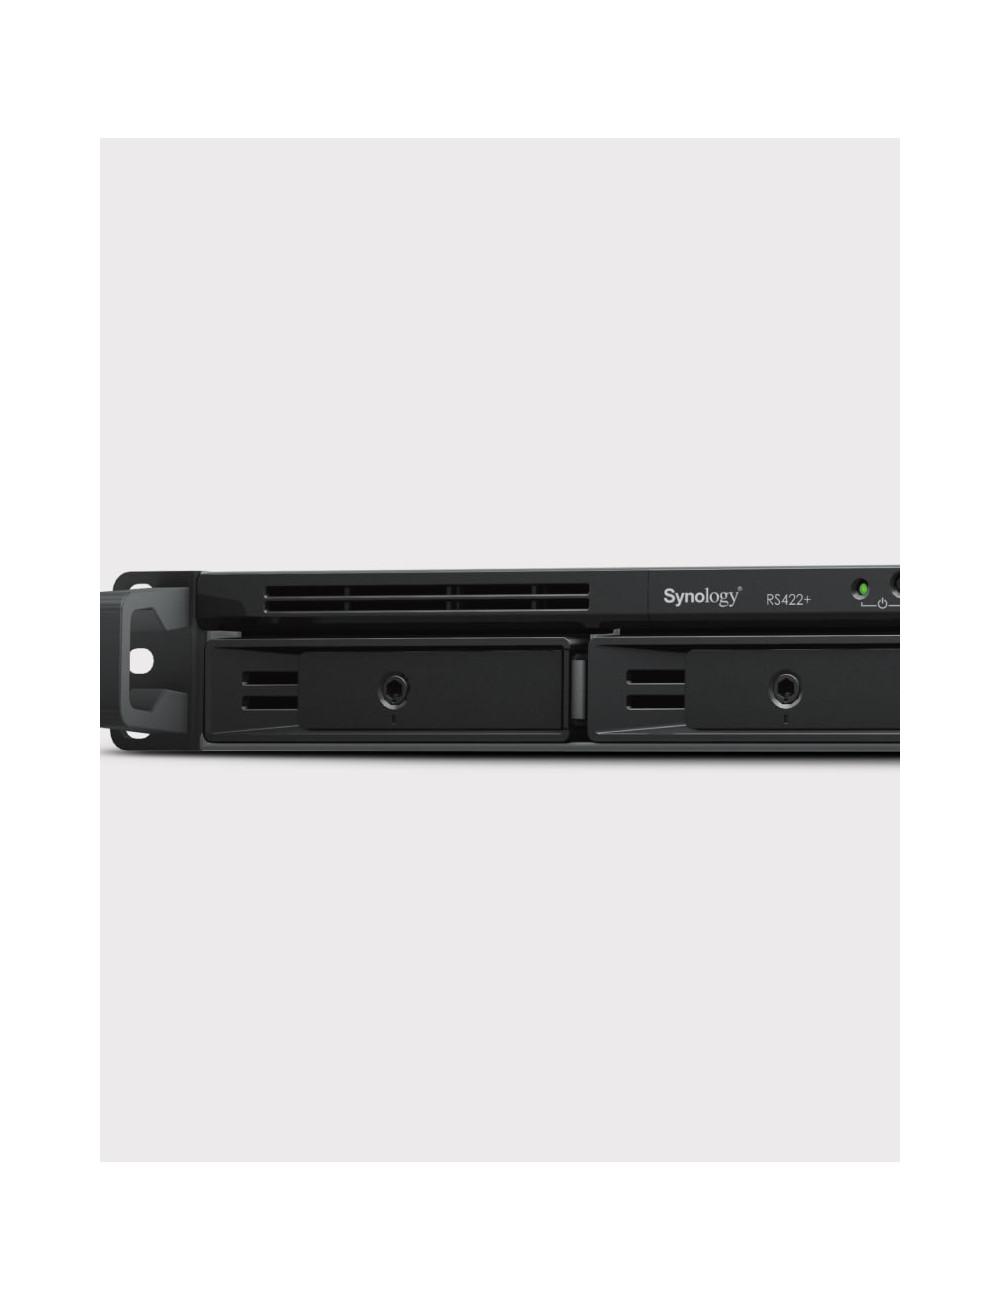 Pack 20 Mailbox Zimbra Basic + Domain .FR - 1 year